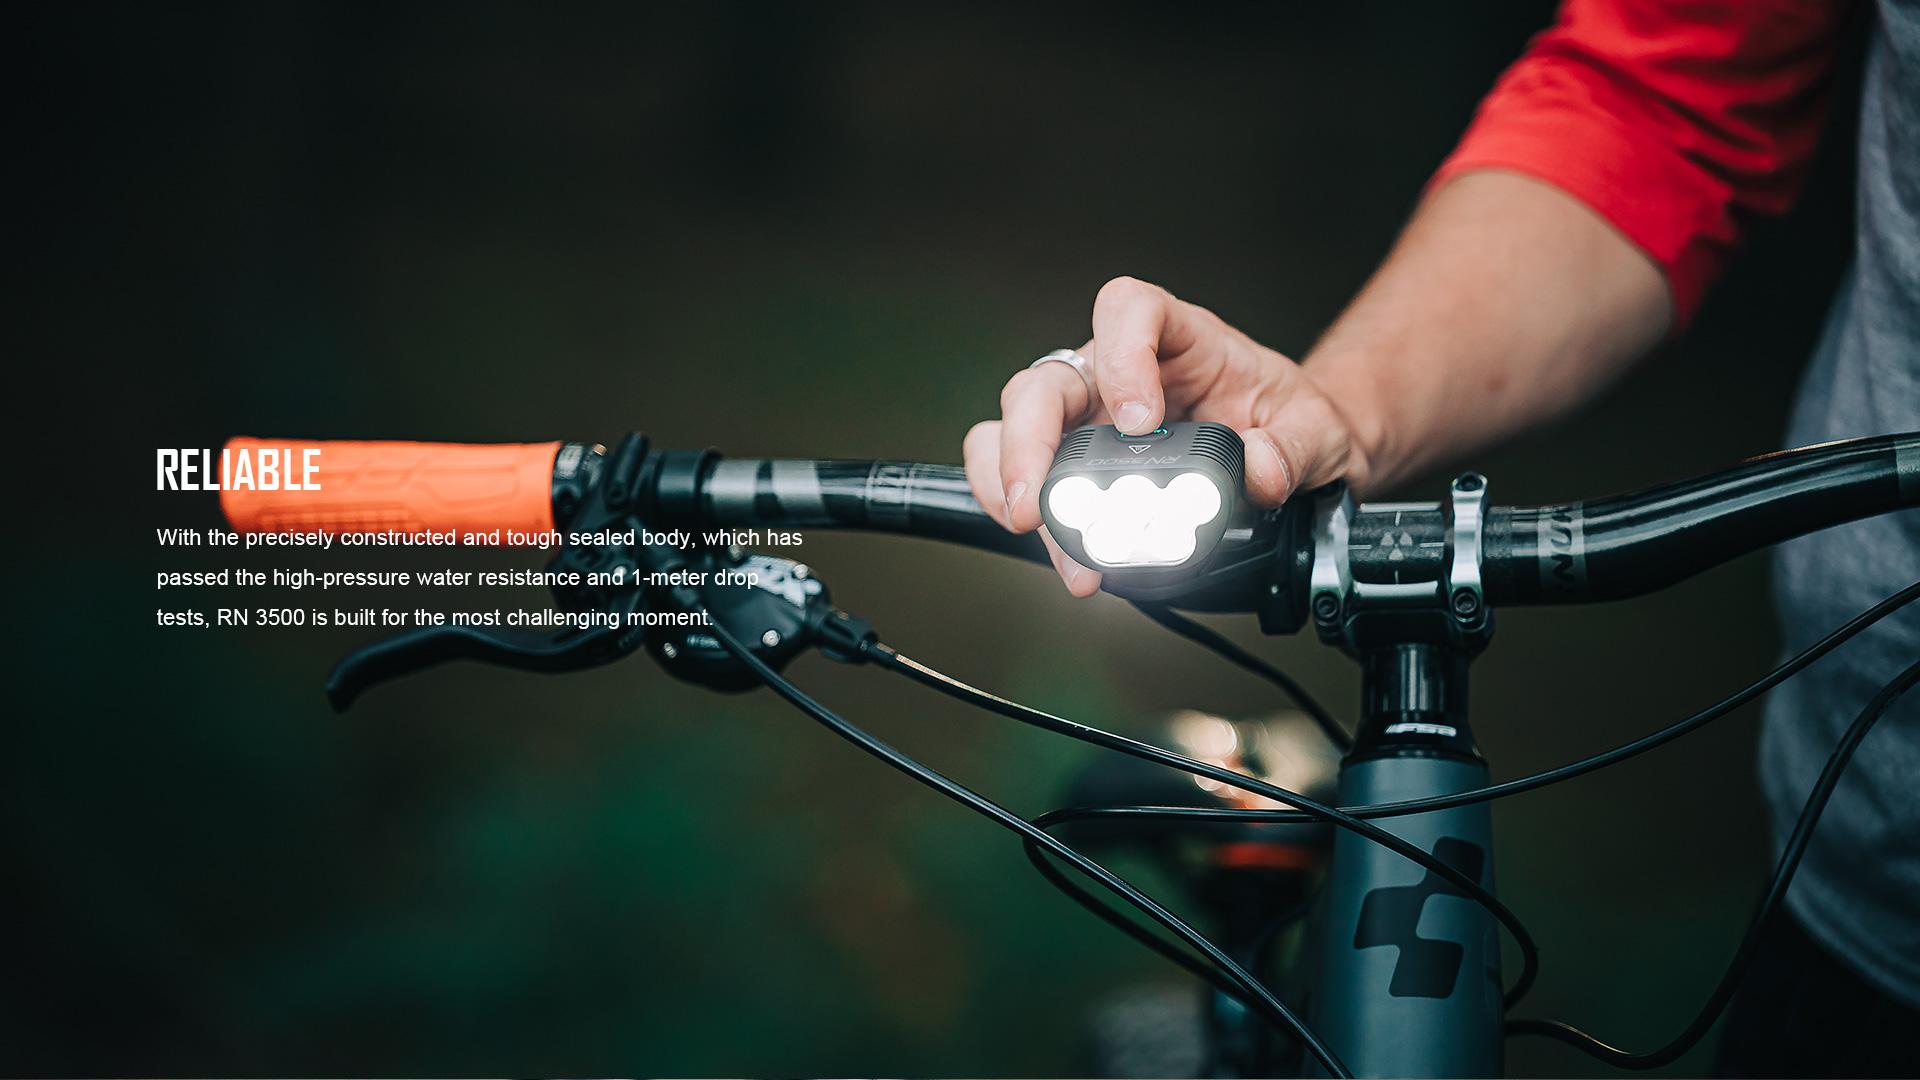 RN 3500 Bike light reliable